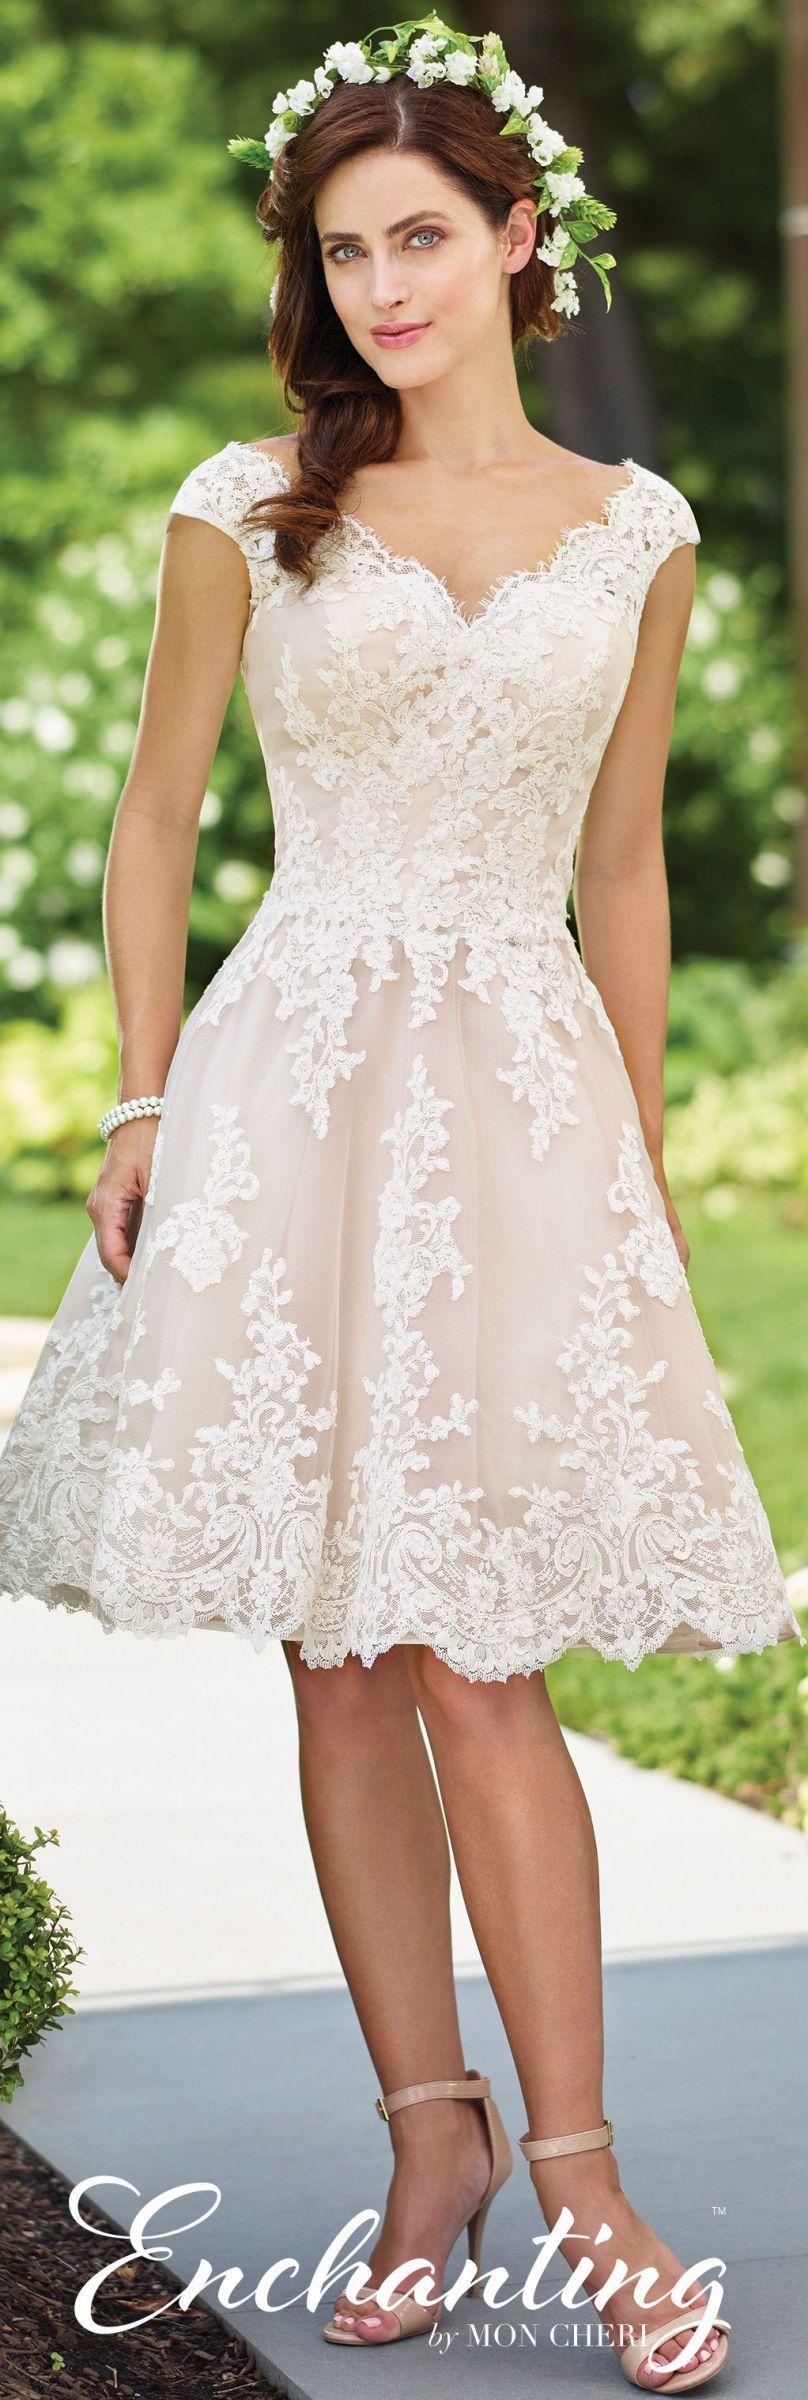 Estilo de pelo largo agresivo para vestidos de novia cortos